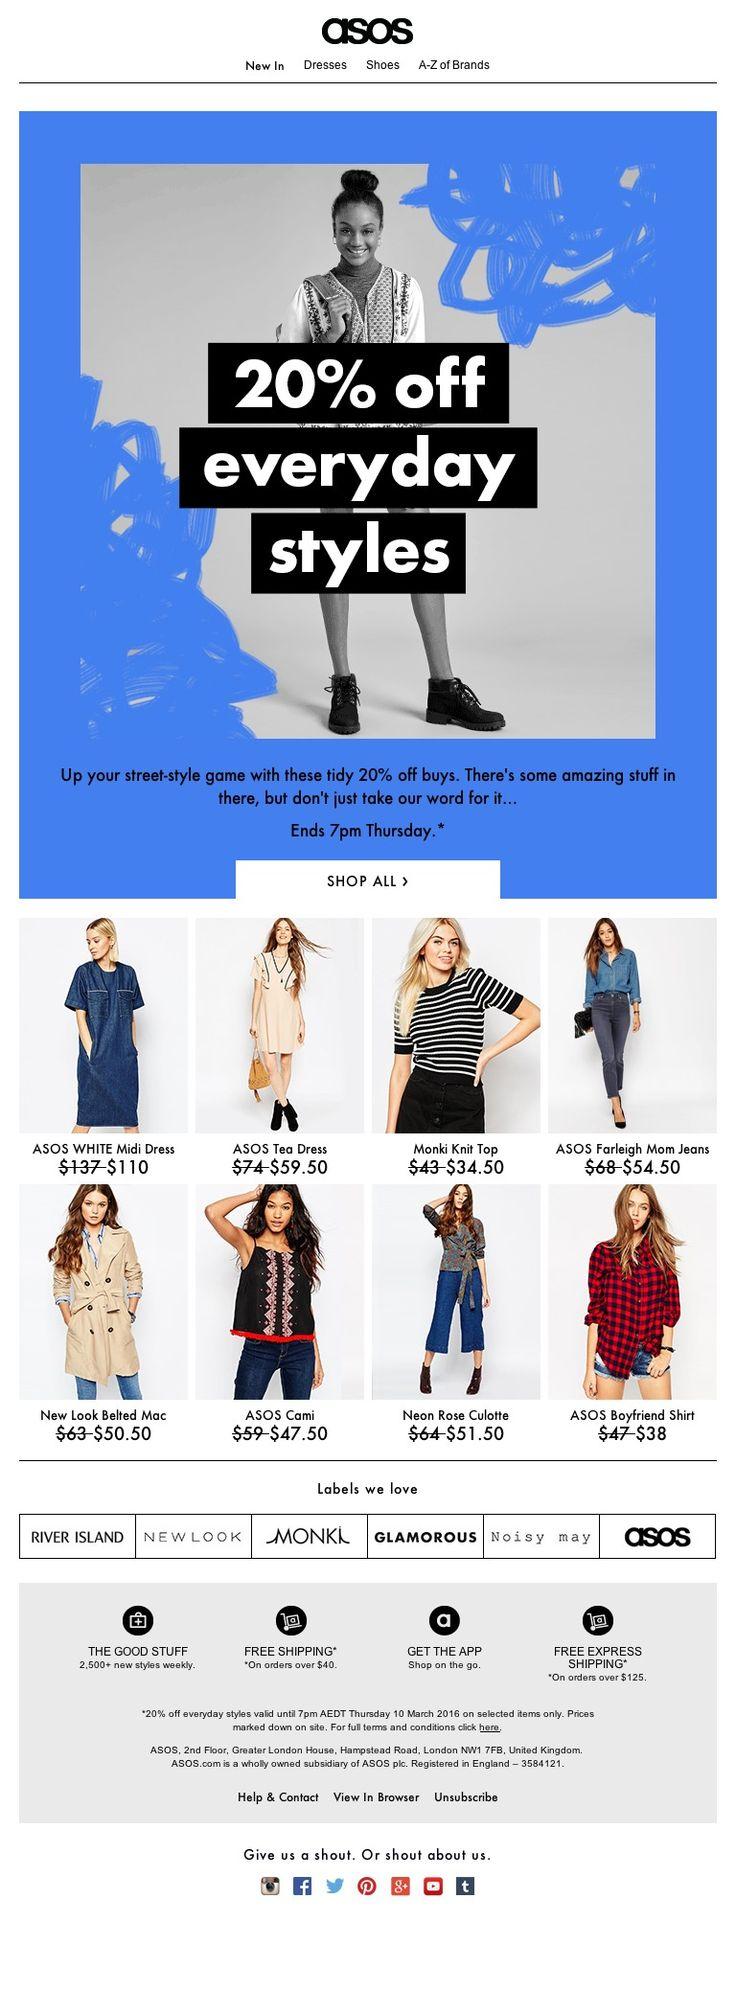 ASOS - 20% off everyday styles